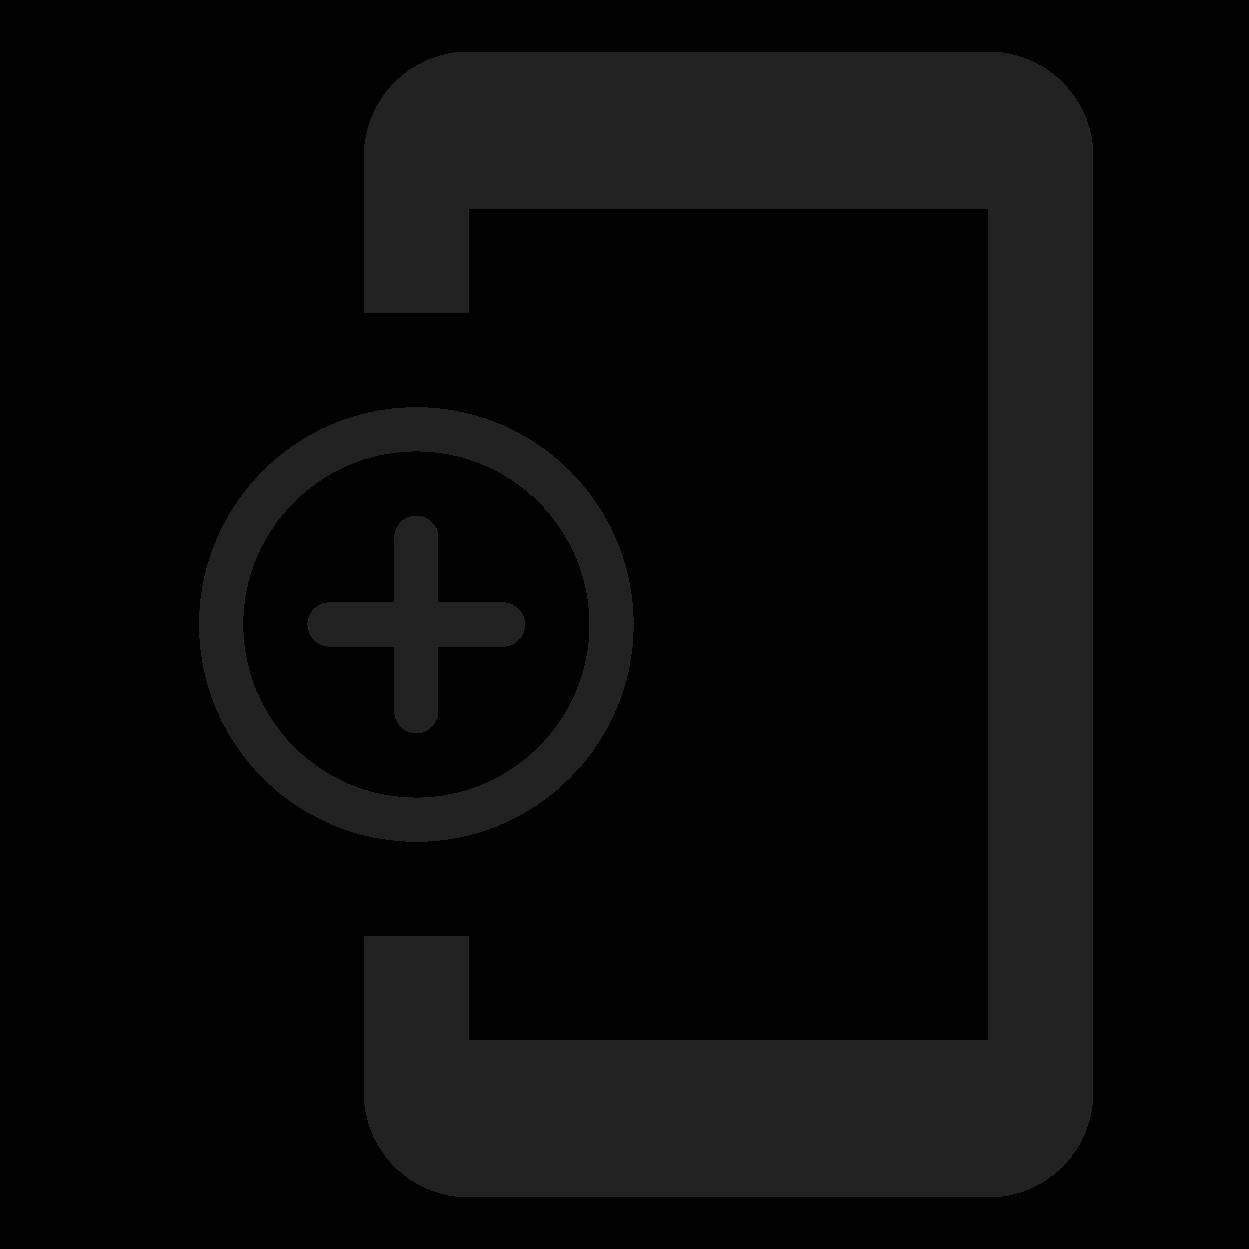 Create link or QR code screen